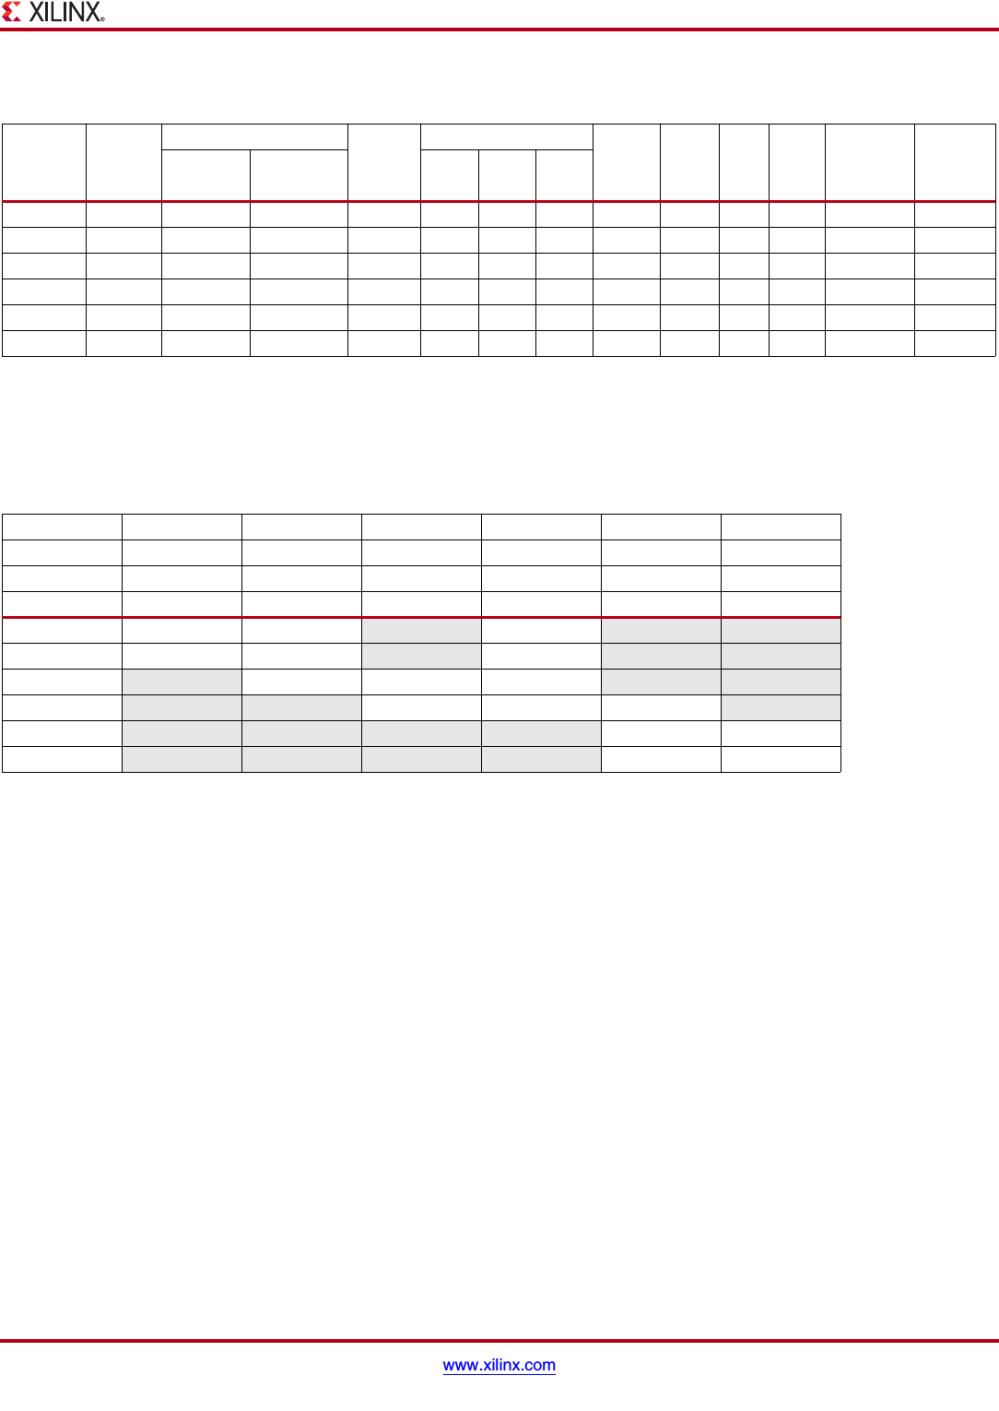 medium resolution of 7 series fpgas data sheet overview